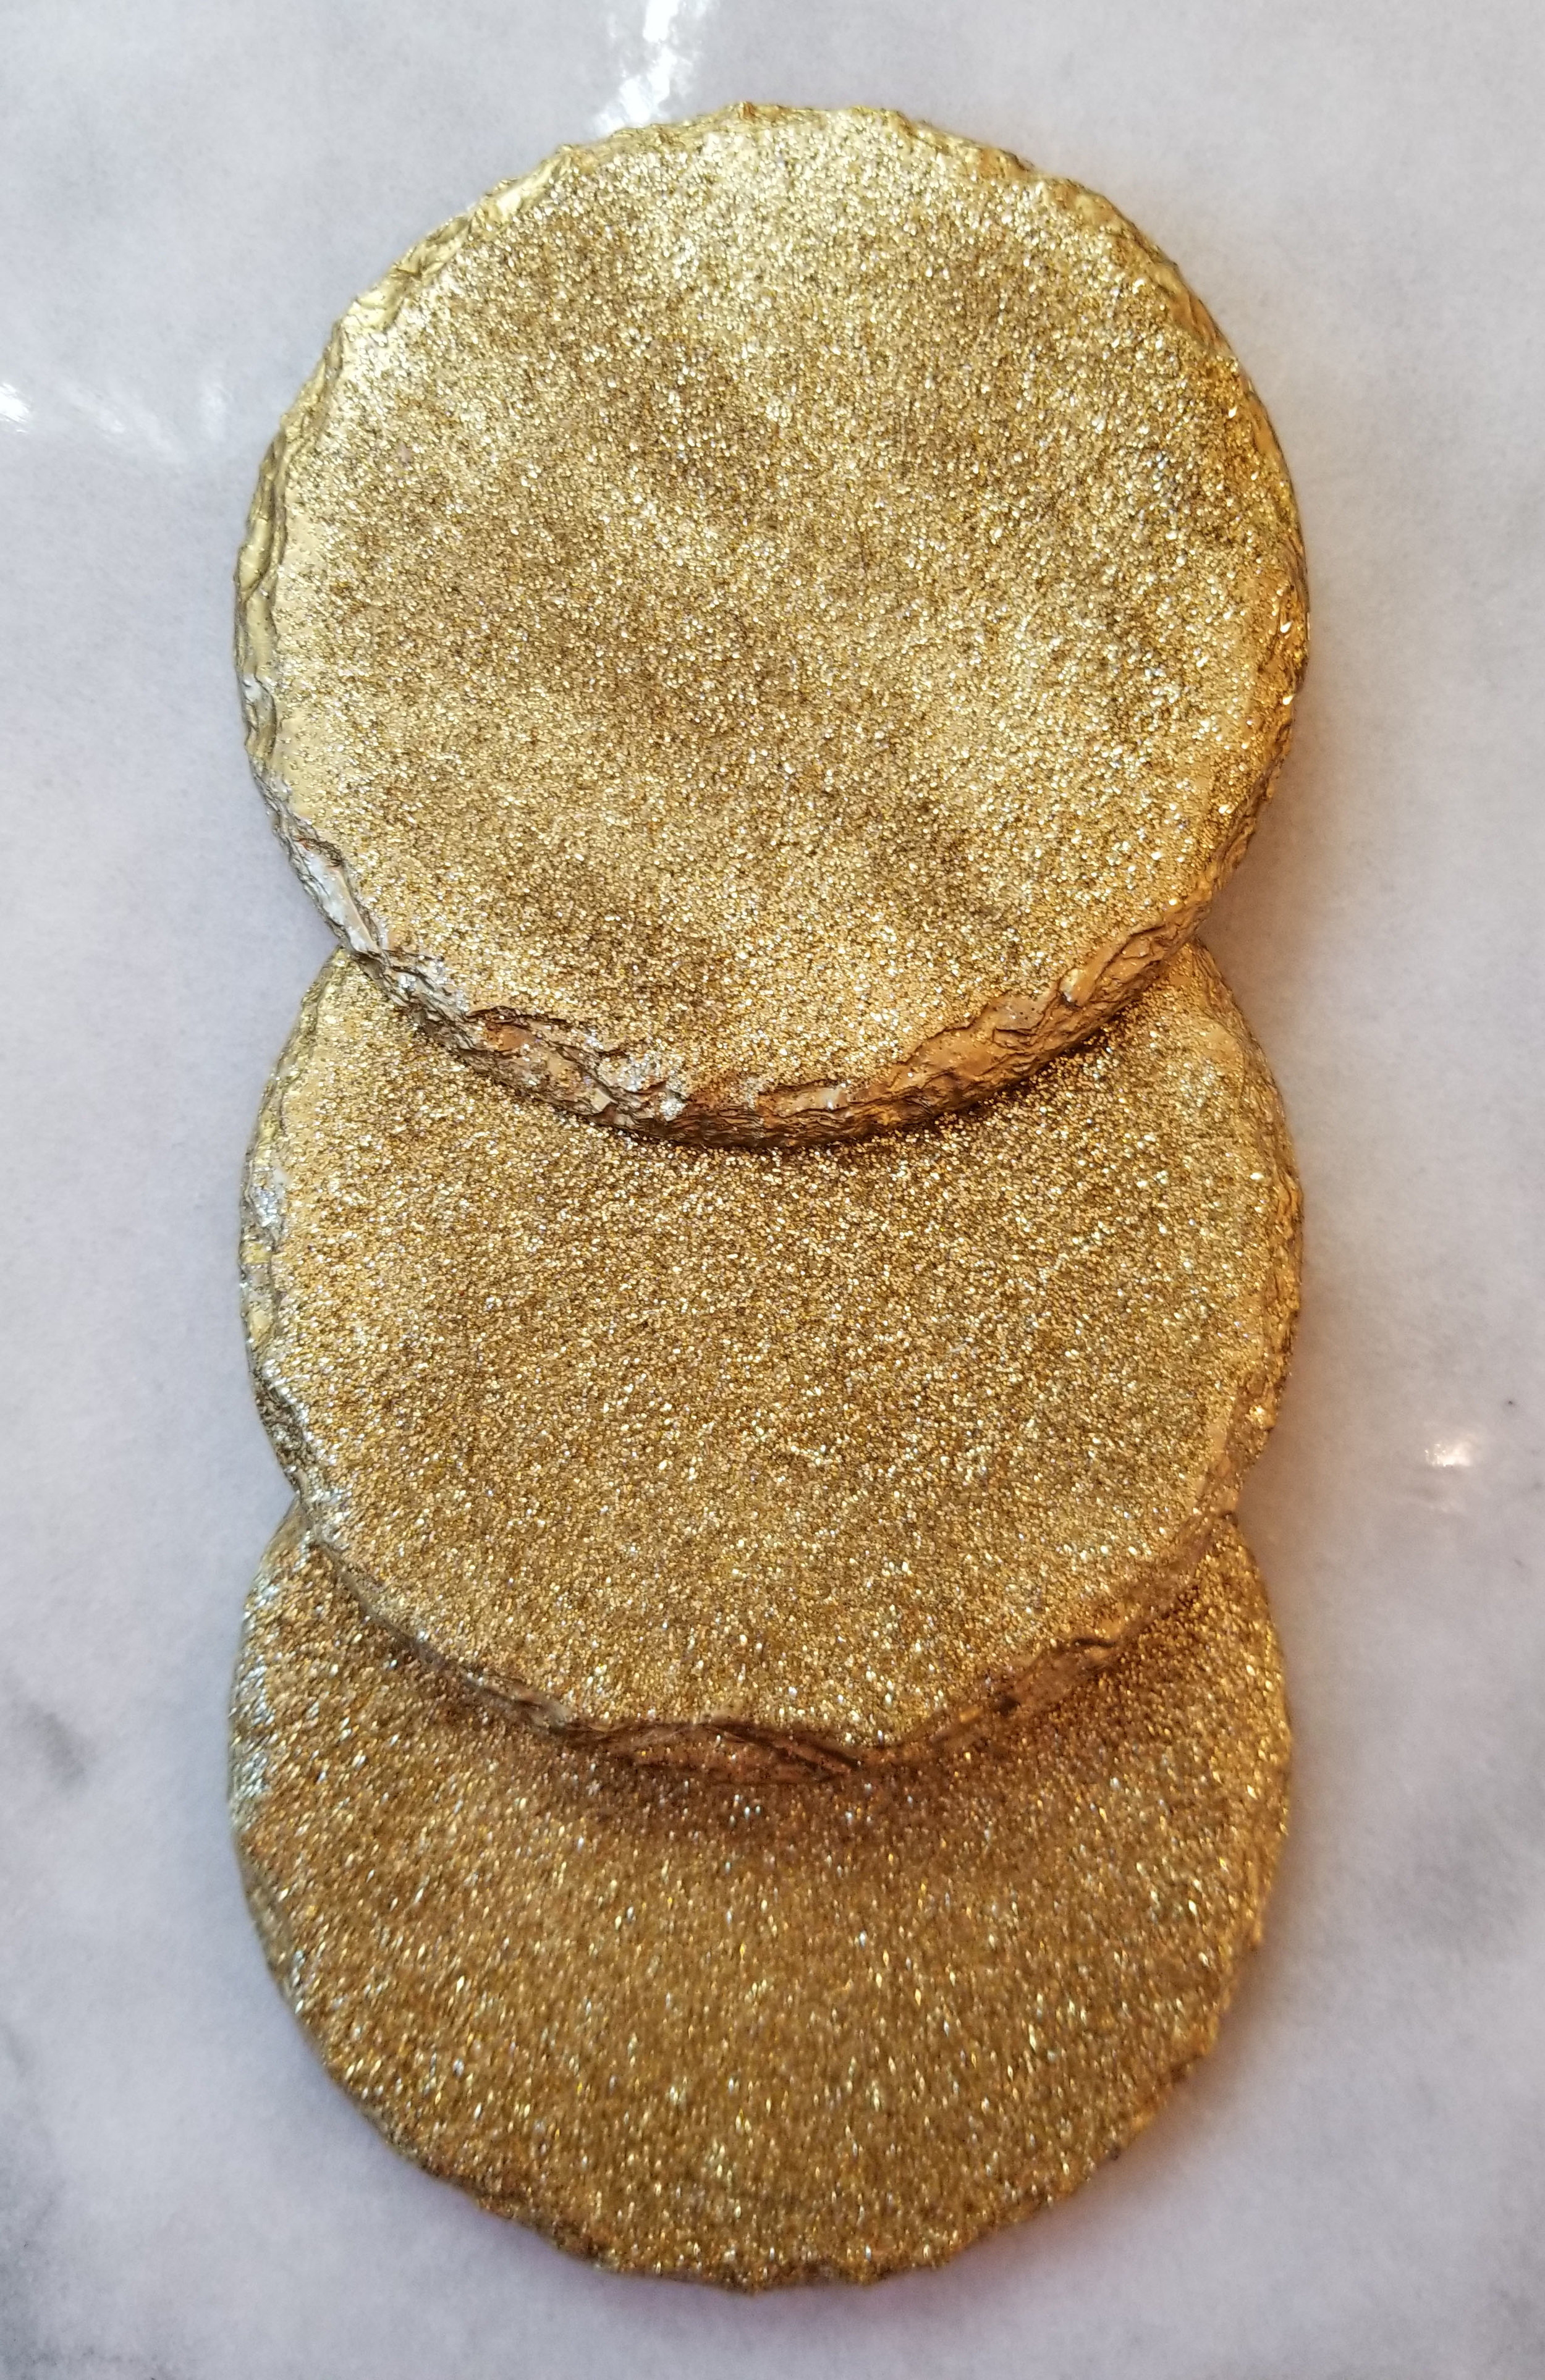 Renee Handmade Gold Glitter Slate Coasters   My Favorite Amazon Finds   Laurel and Iron